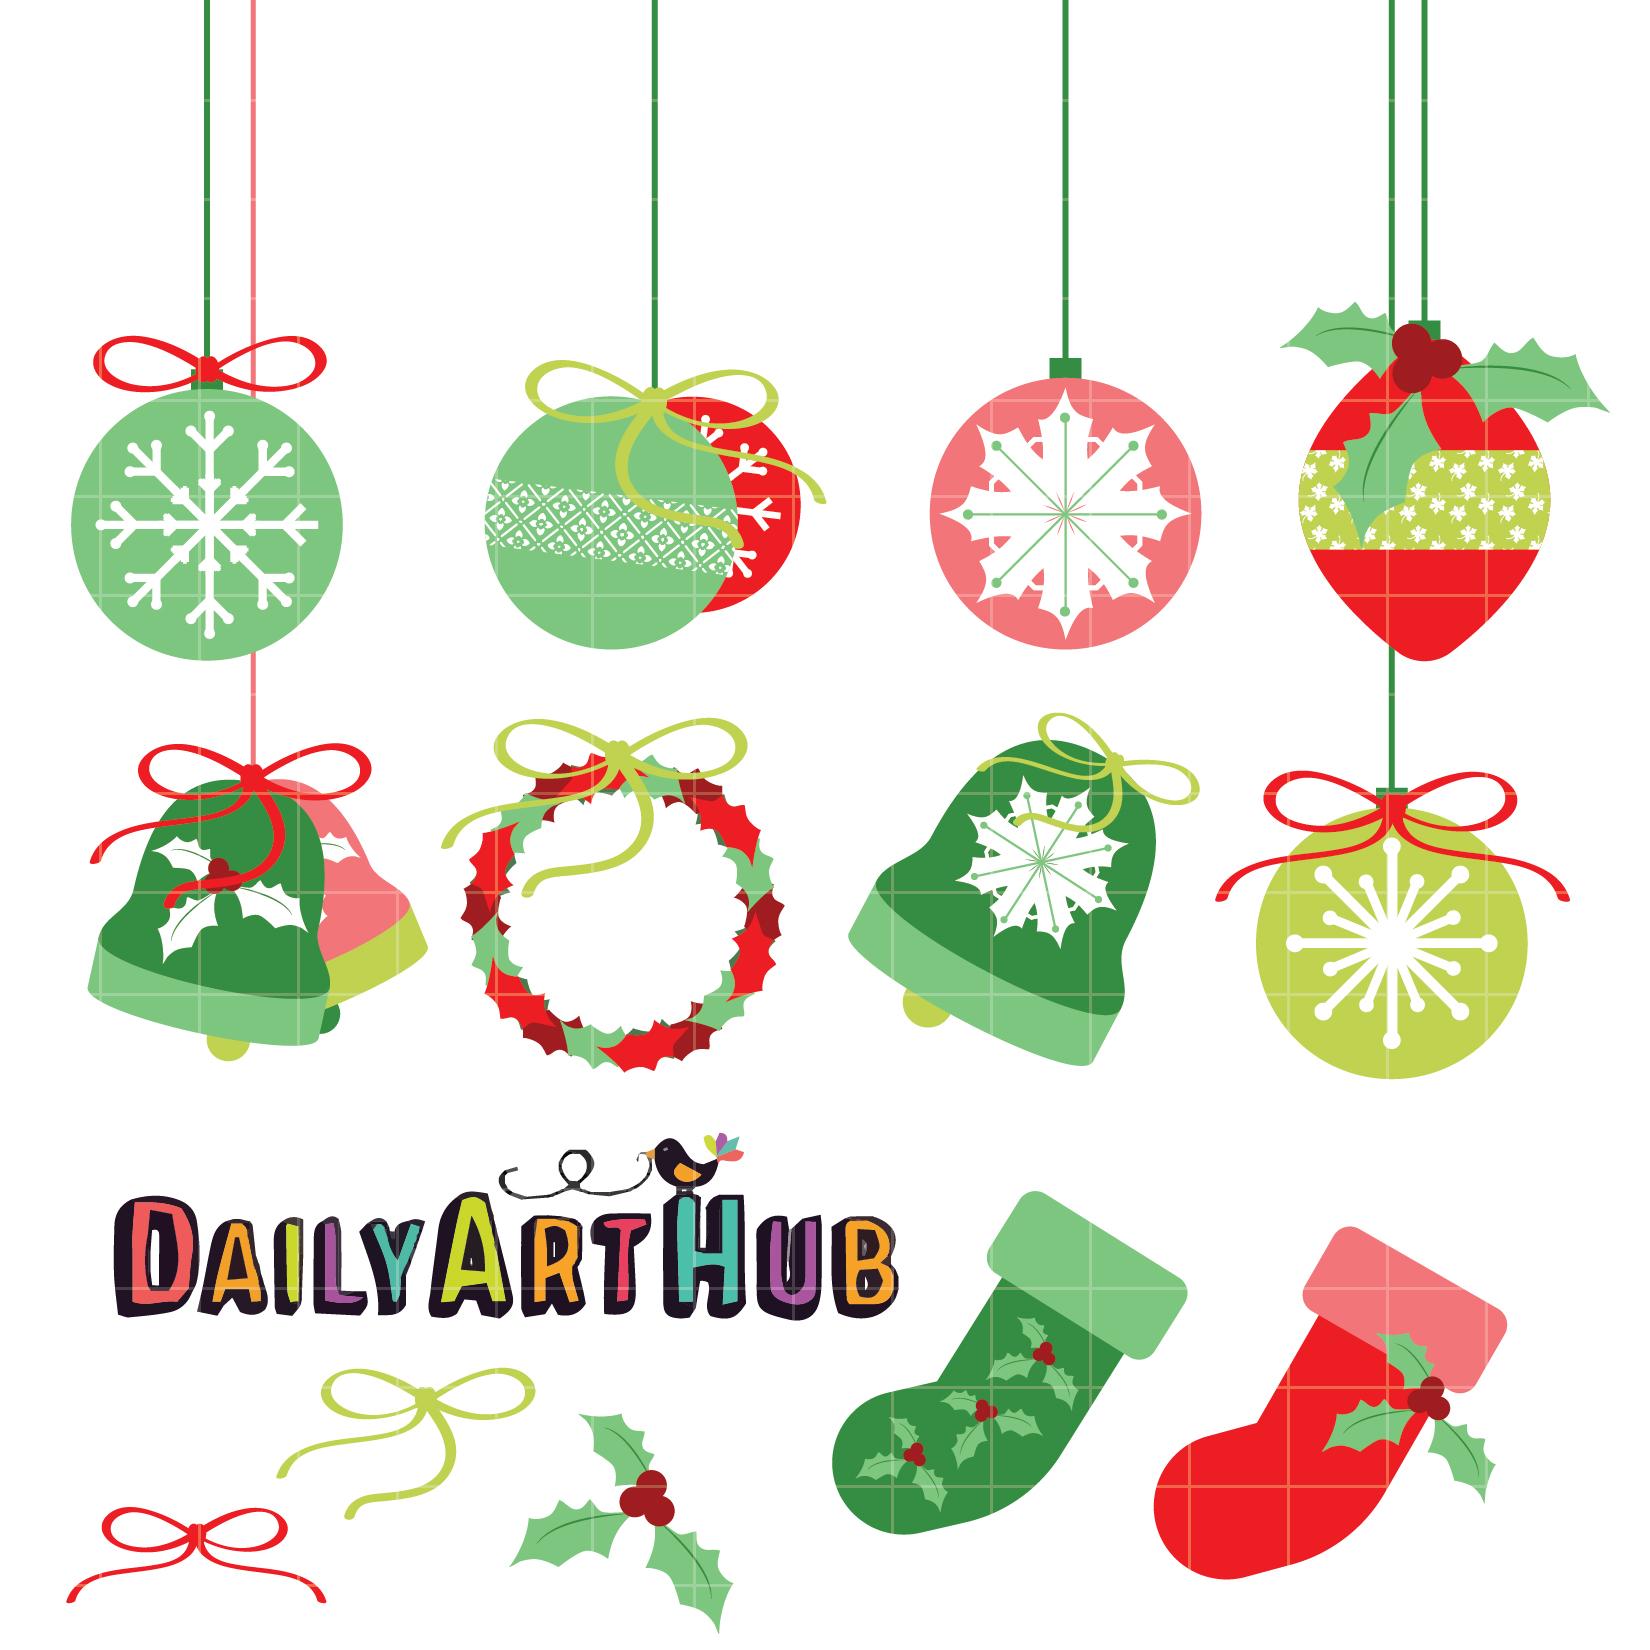 Christmas Decorations Clip Art Set Daily Art Hub Free Clip Art Everyday